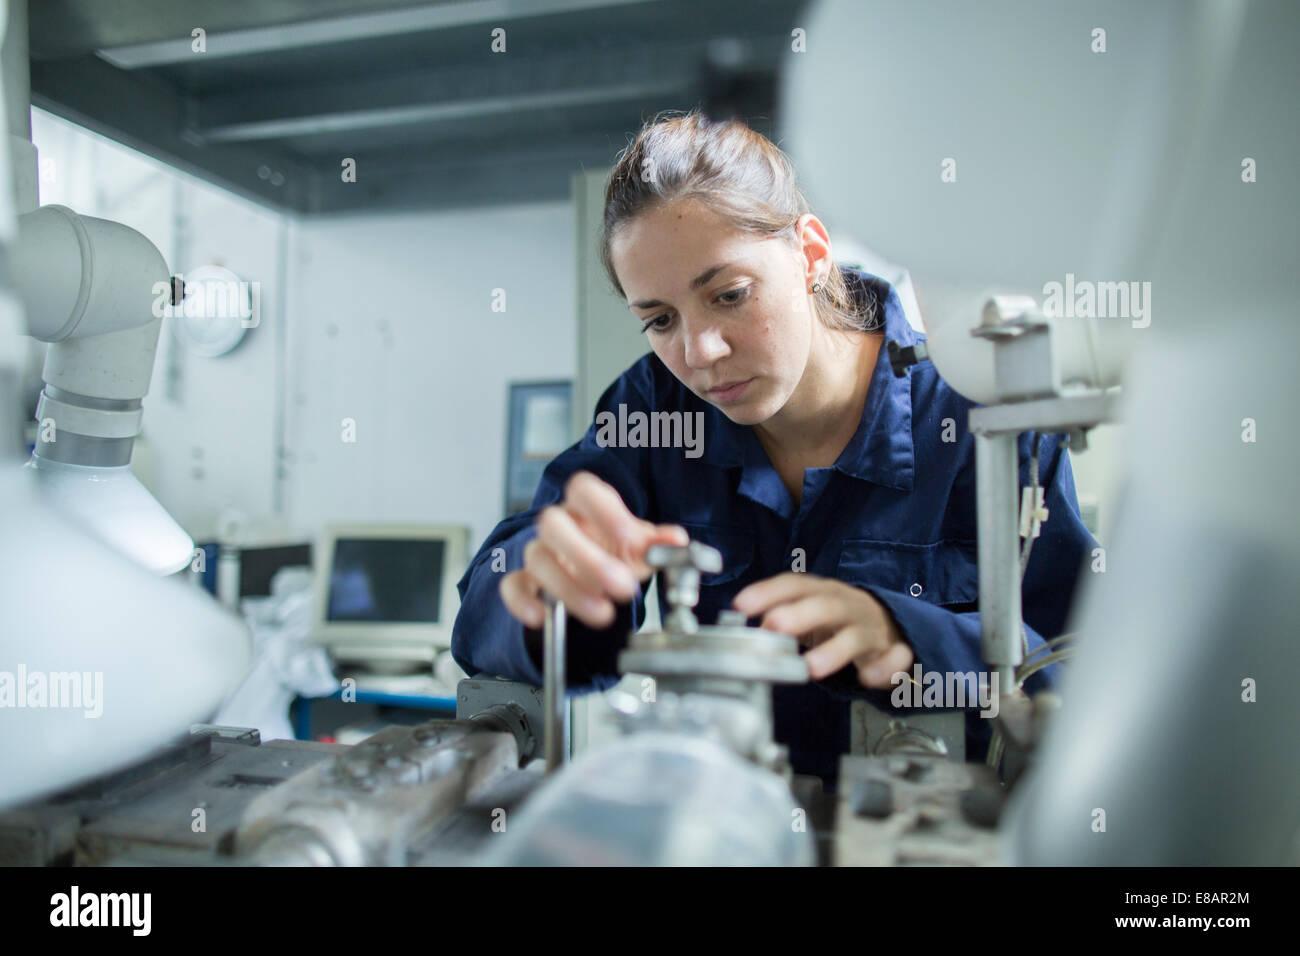 Ingegnere femmina ruotando le valvole sul factory piping industriale Immagini Stock